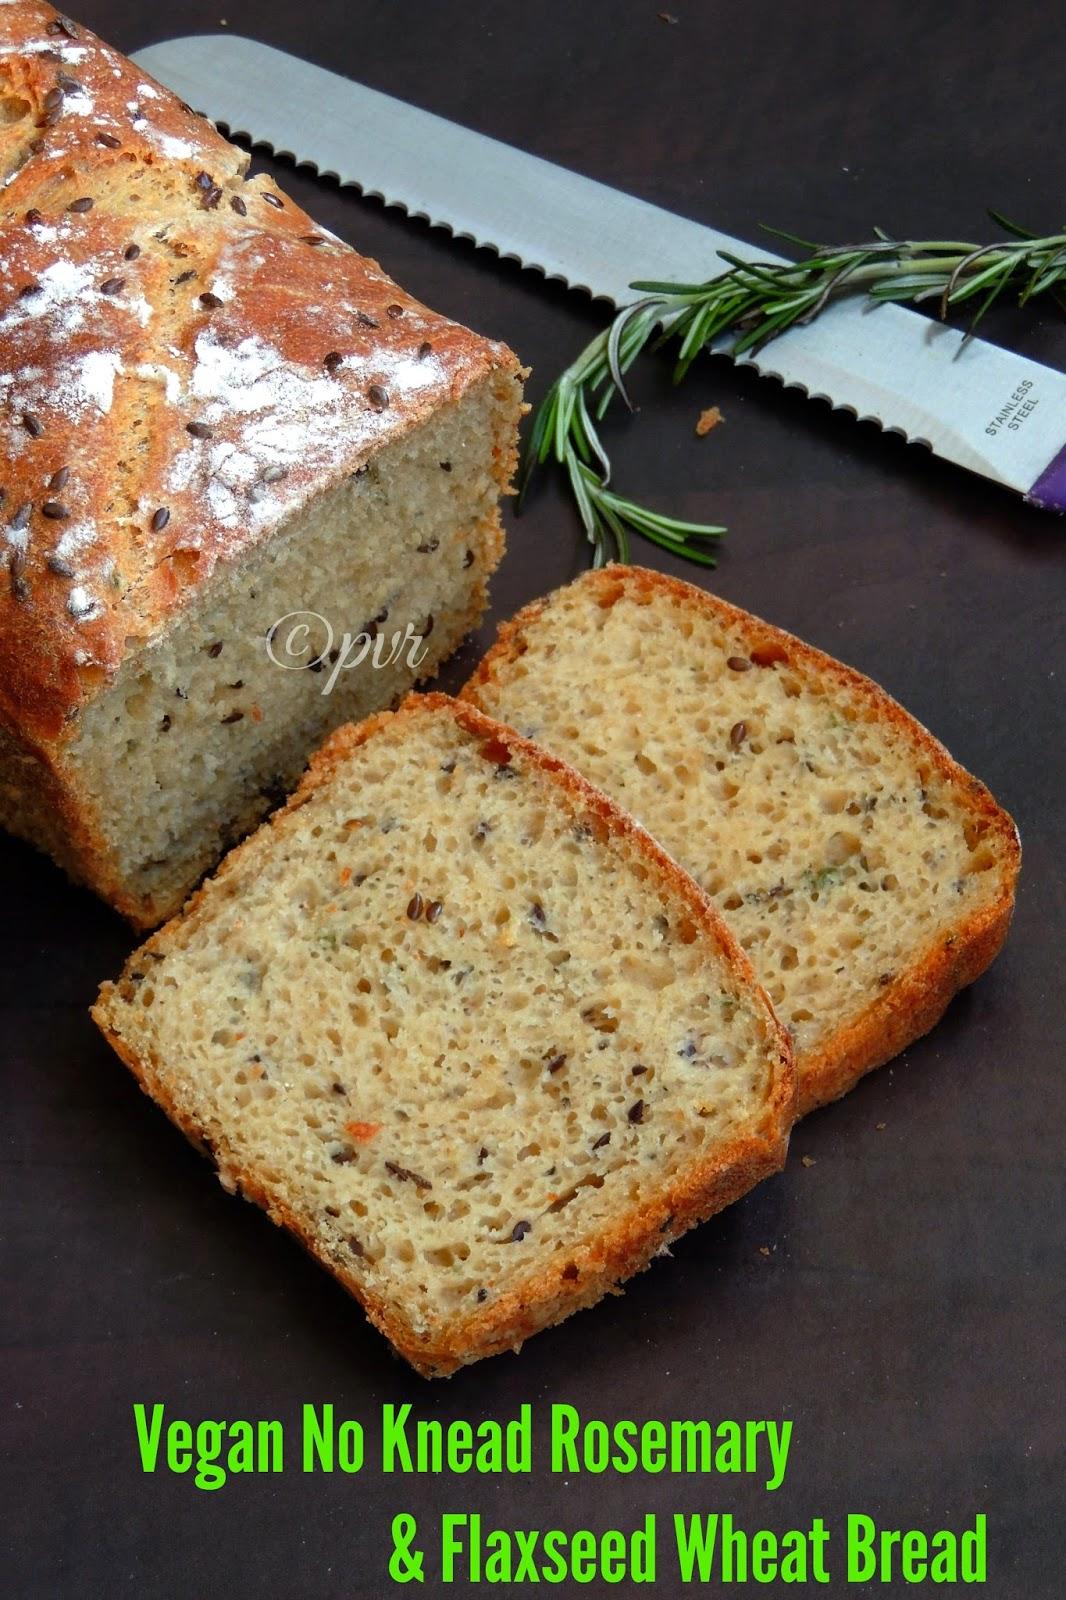 No knead vegan rosemary and flaxseed bread, Herb & Flaxseed loaded no knead whole wheat bread loaf, No knead whole wheat bread loaf